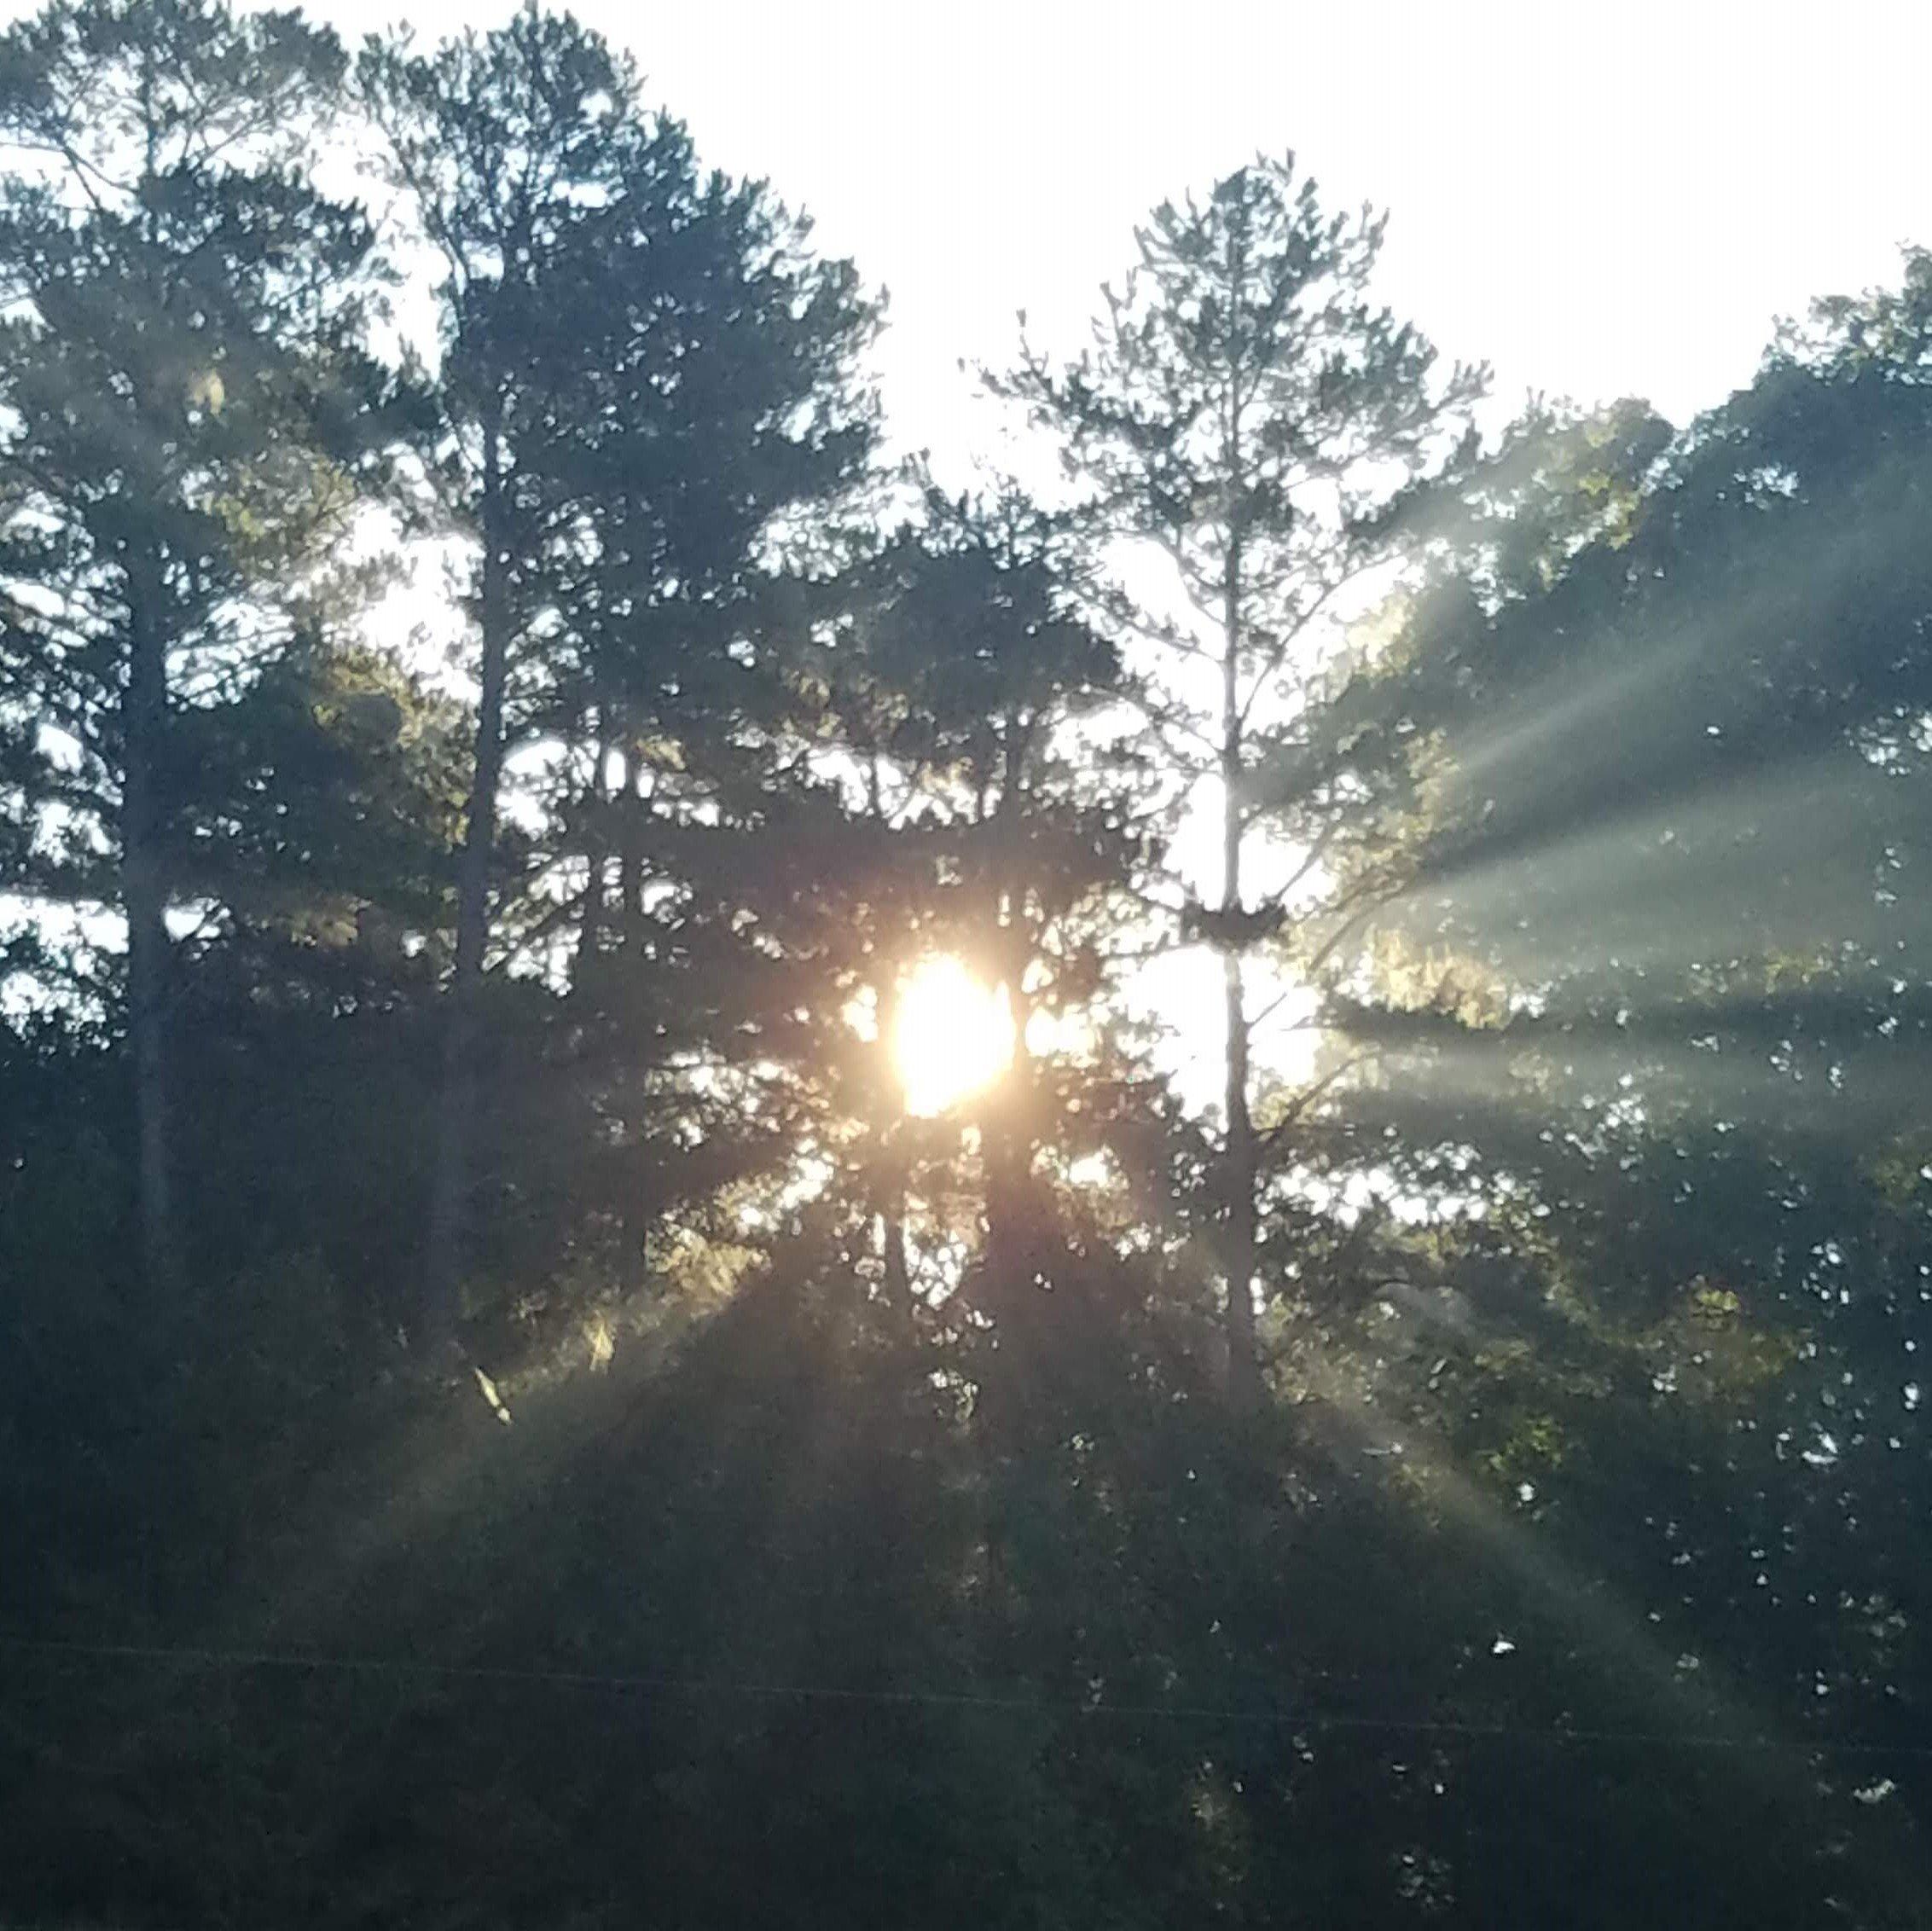 sunrise light through trees